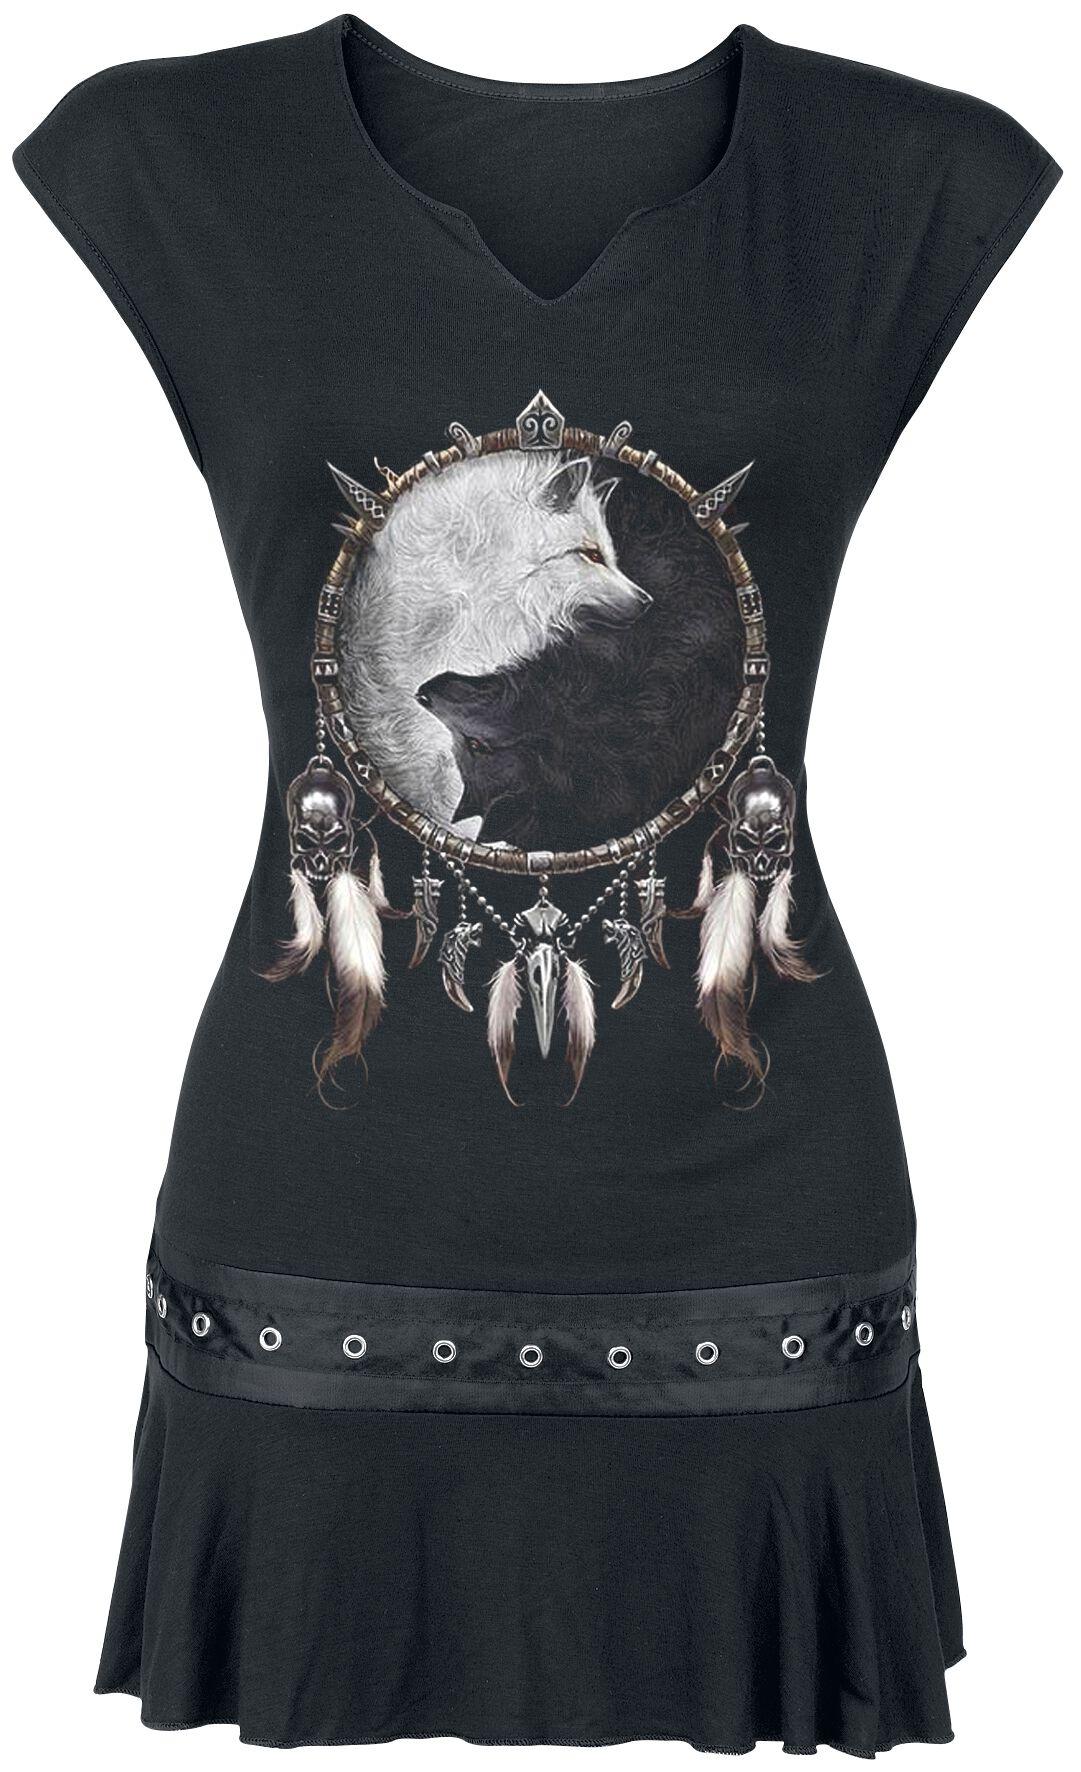 Spiral Wolf Chi Koszulka damska czarny